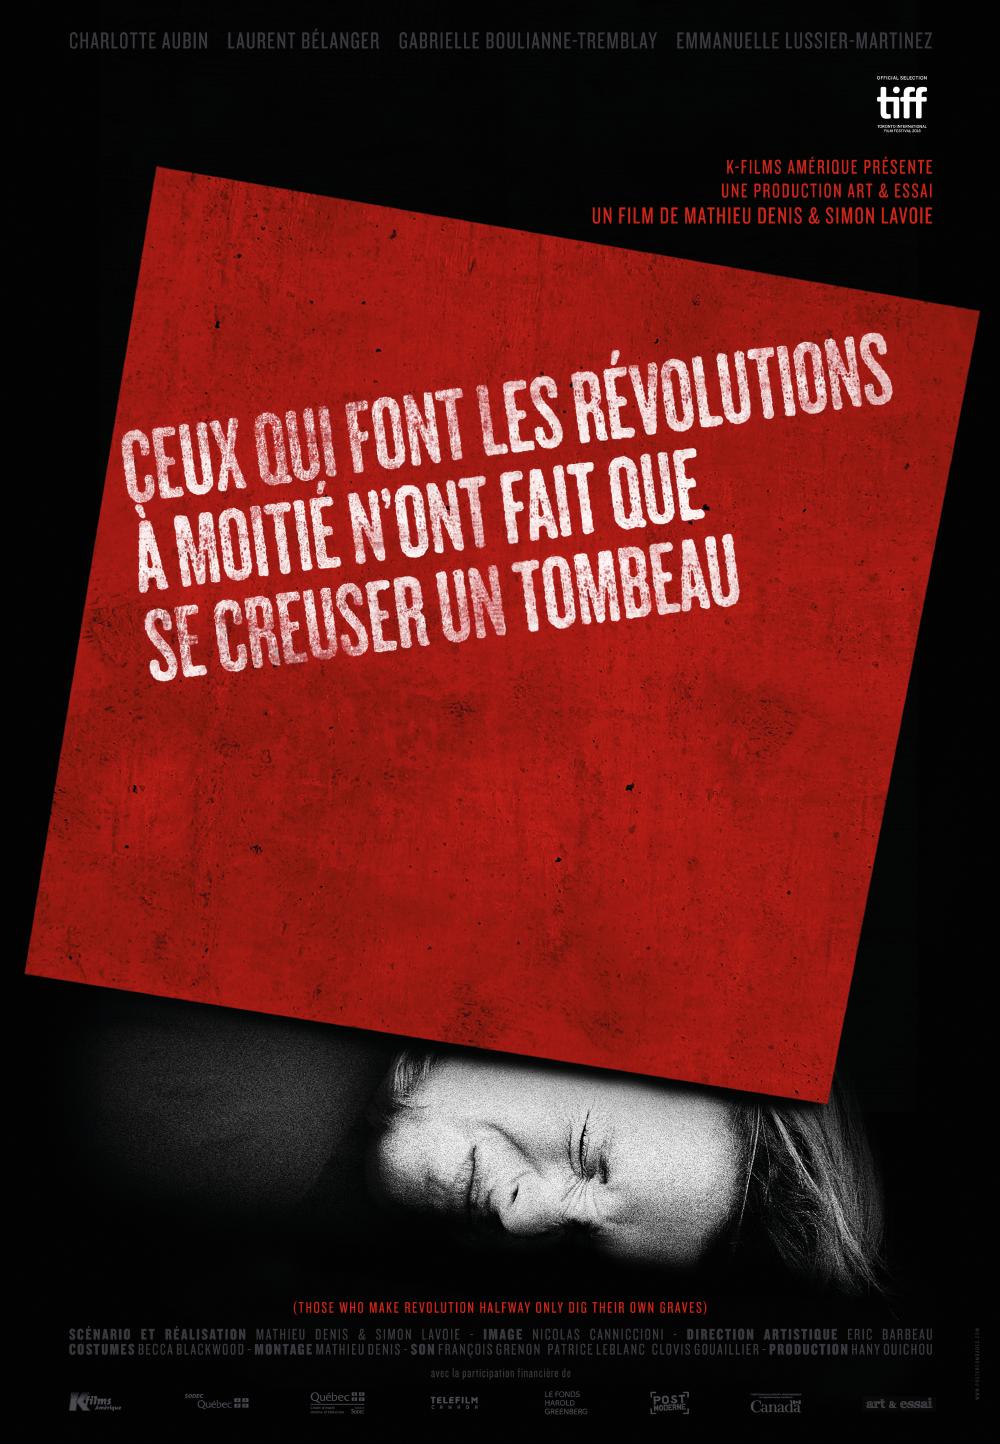 postercomrades-camaradesaffichistes-Renzo-132.PNG